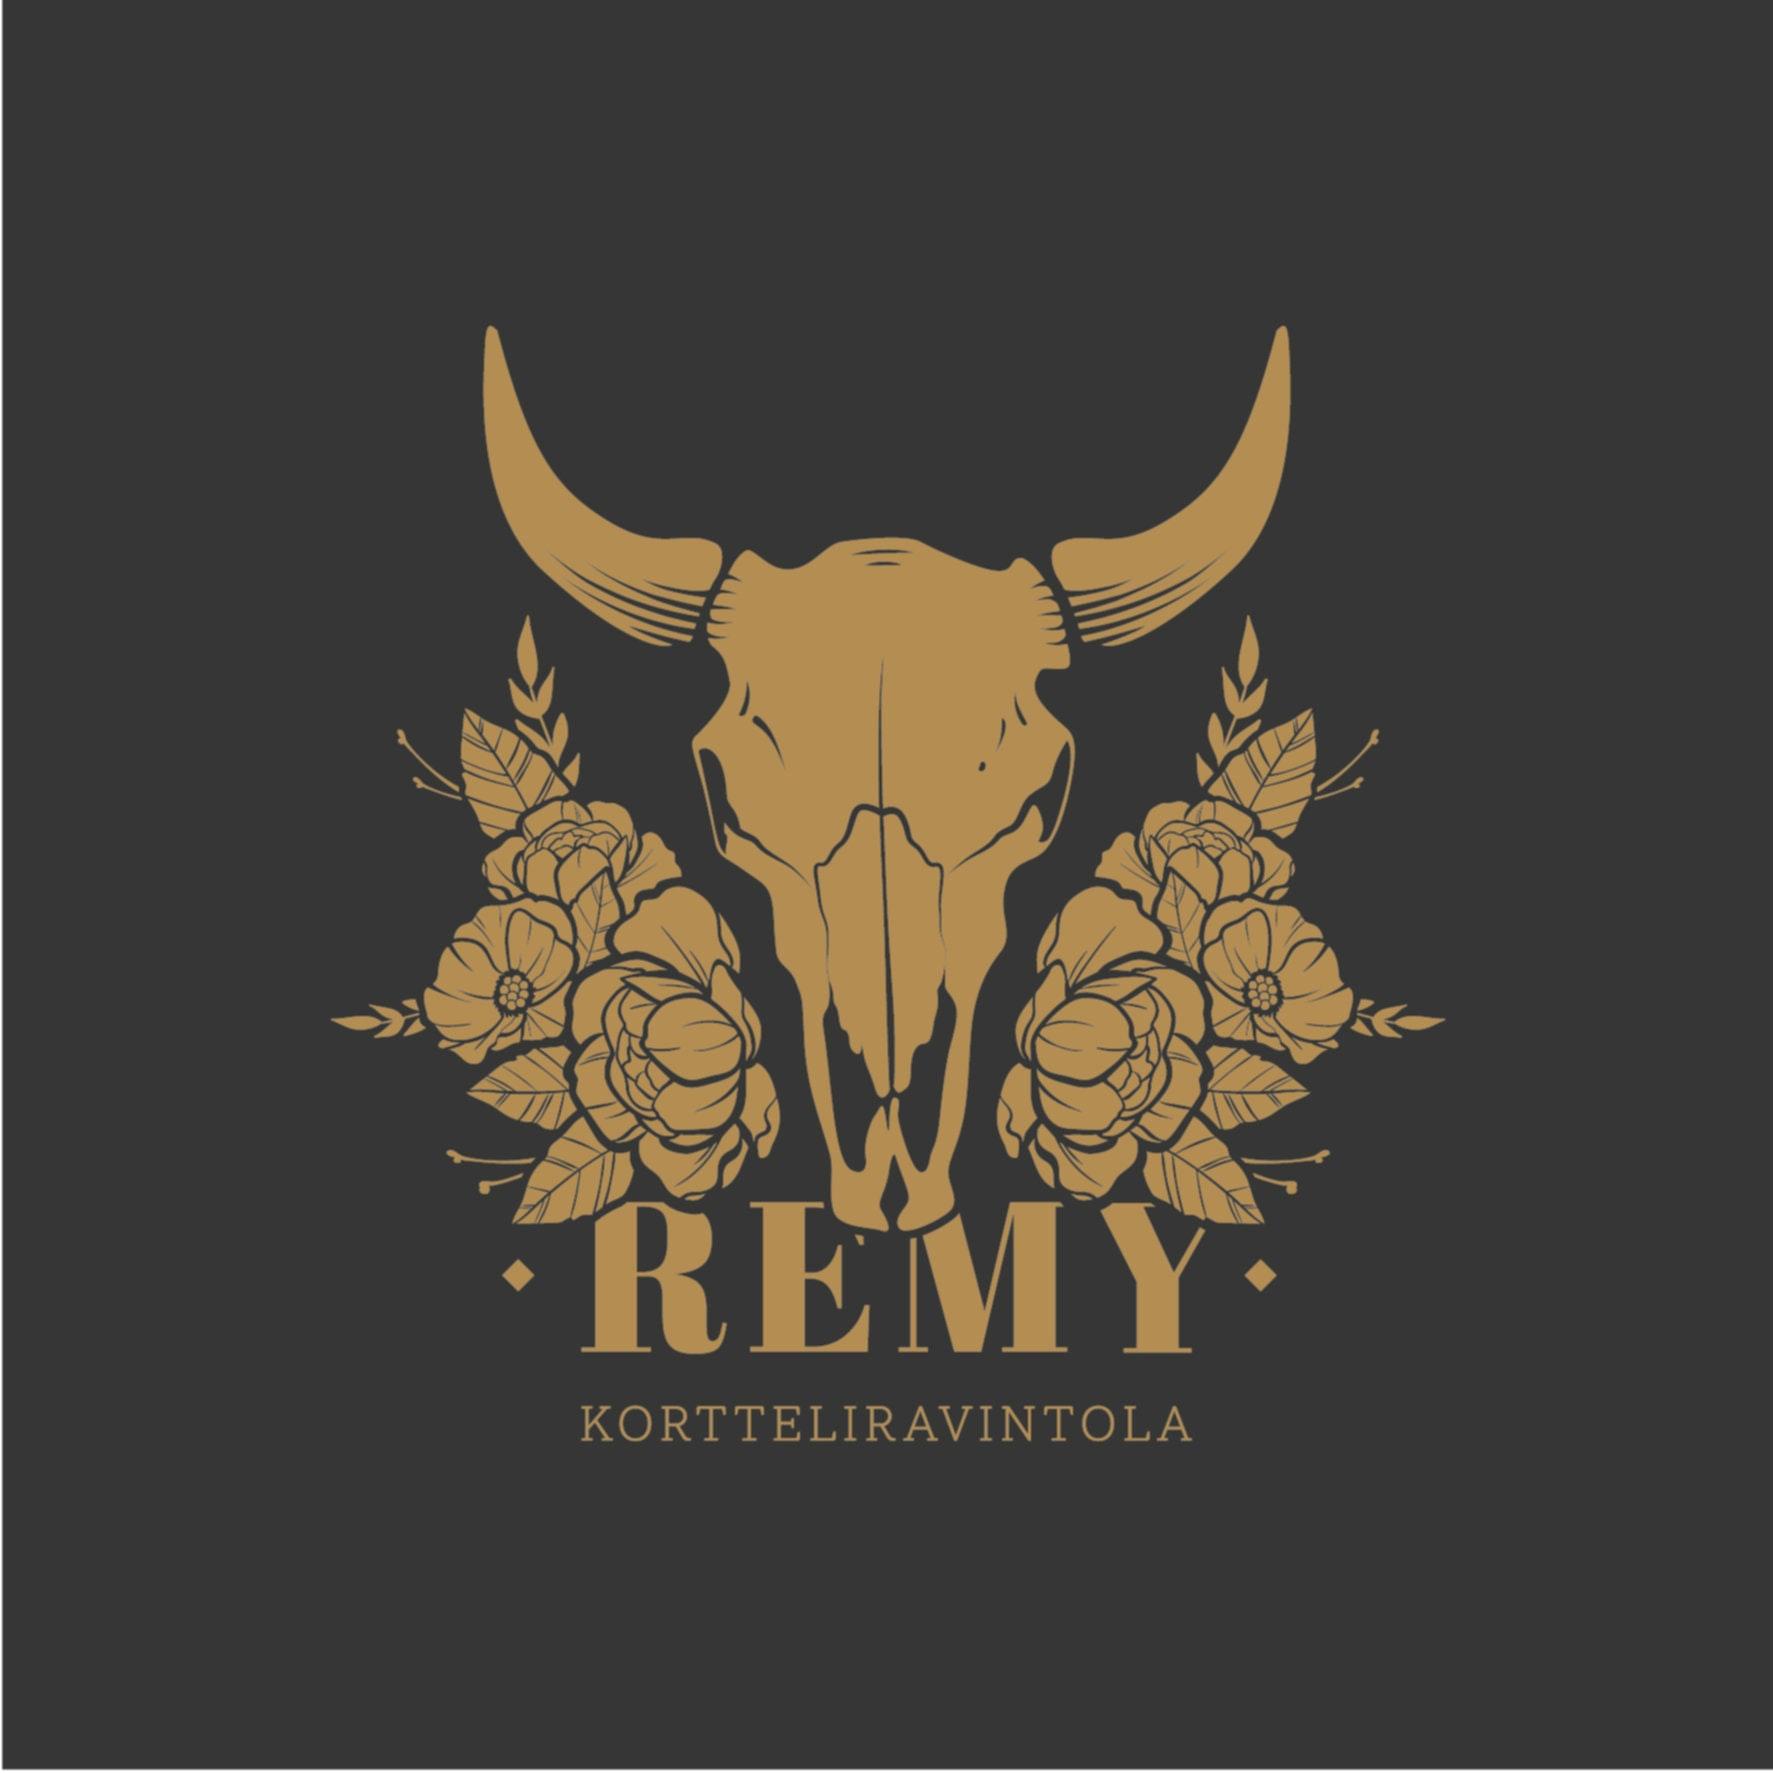 Kortteliravintola Remy